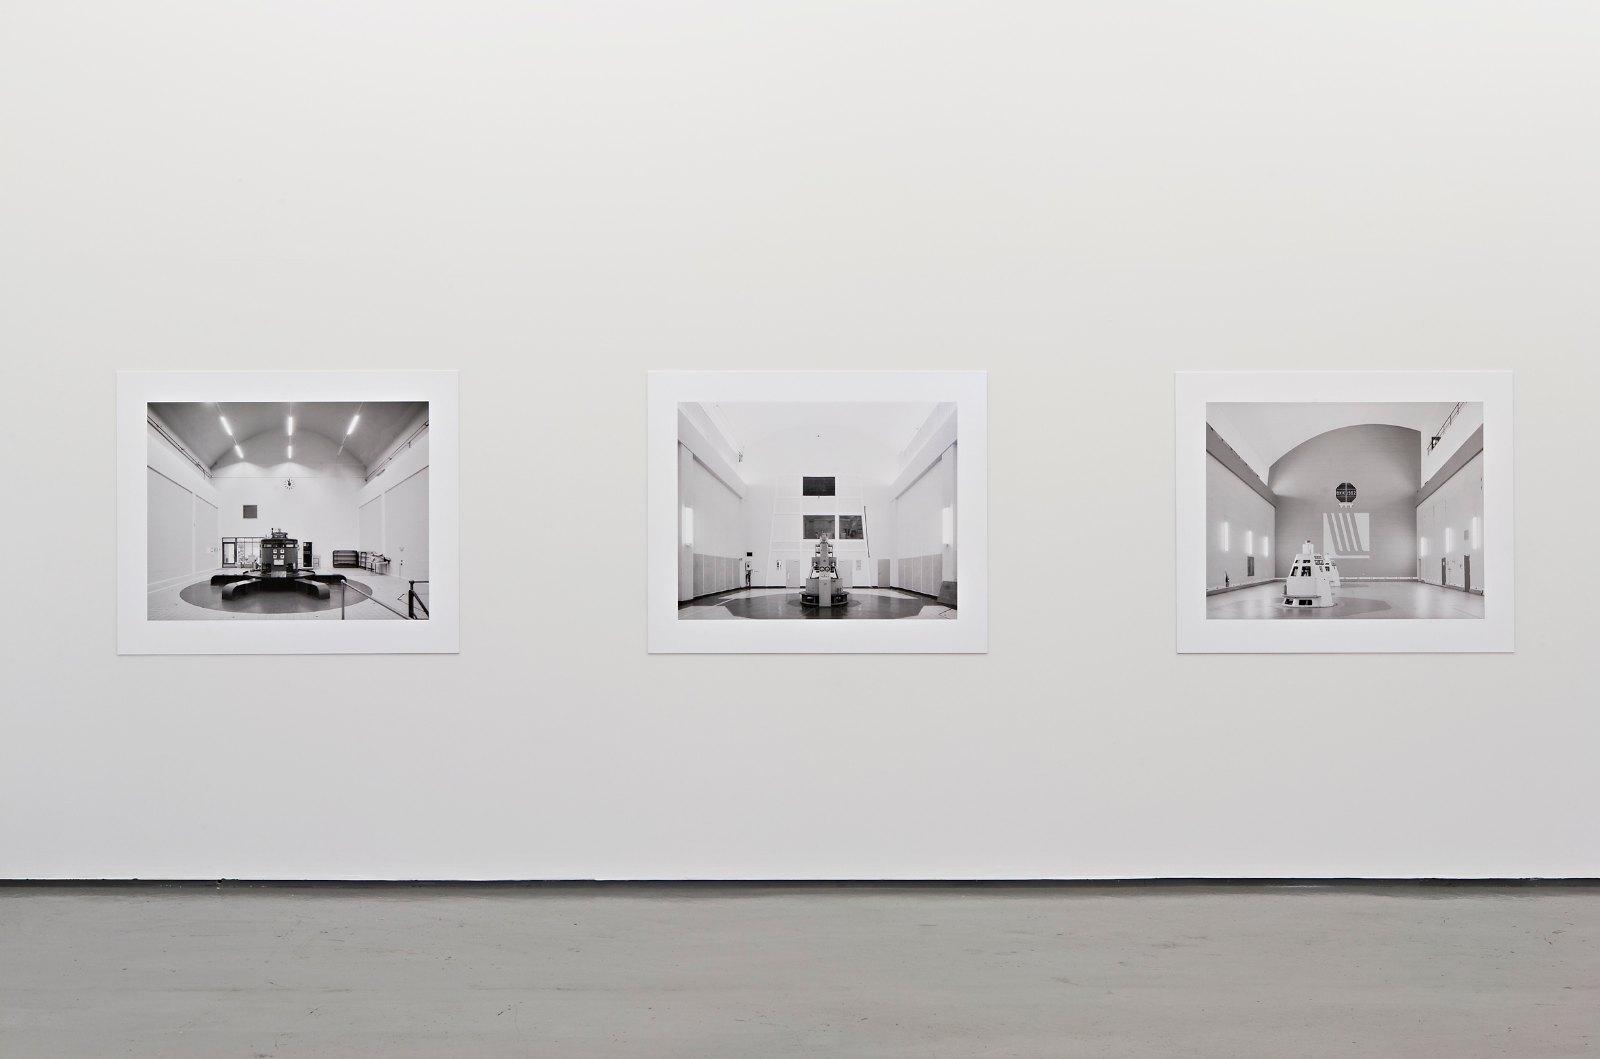 Installation view, Per Berntsen, Generator, Galleri Riis, Oslo, 2008